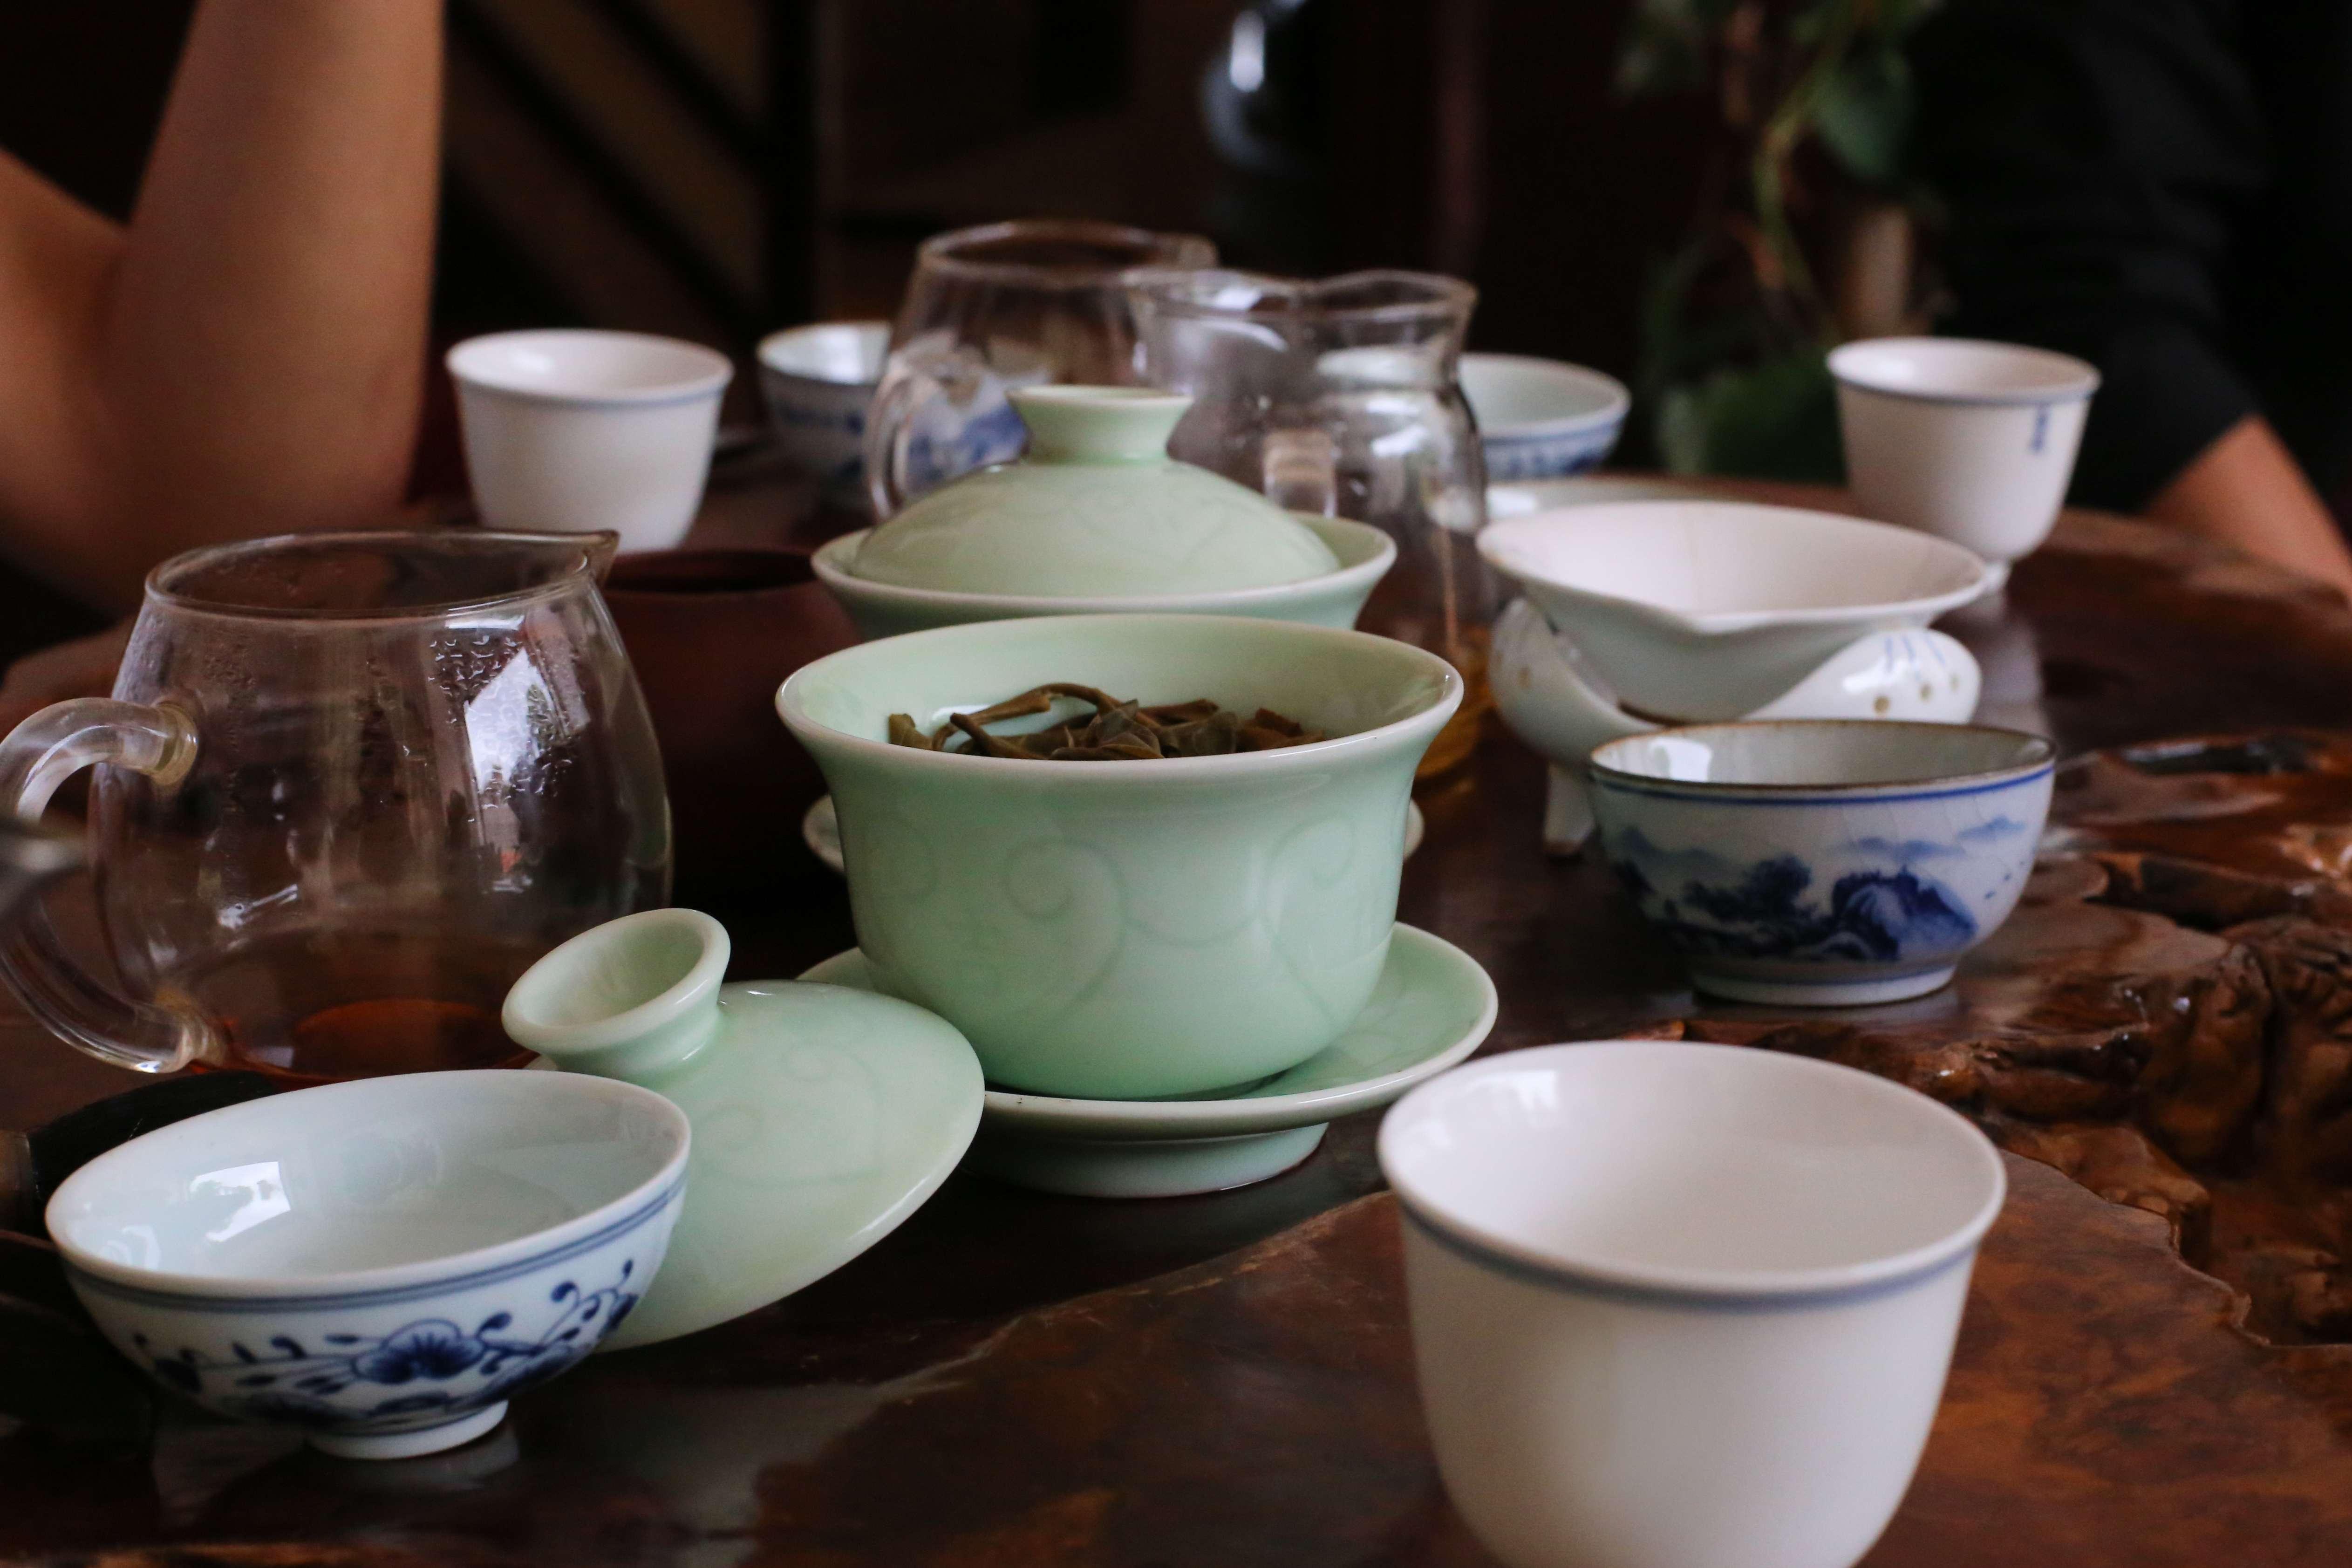 Do Tea Companies Offer Too Many Teas?